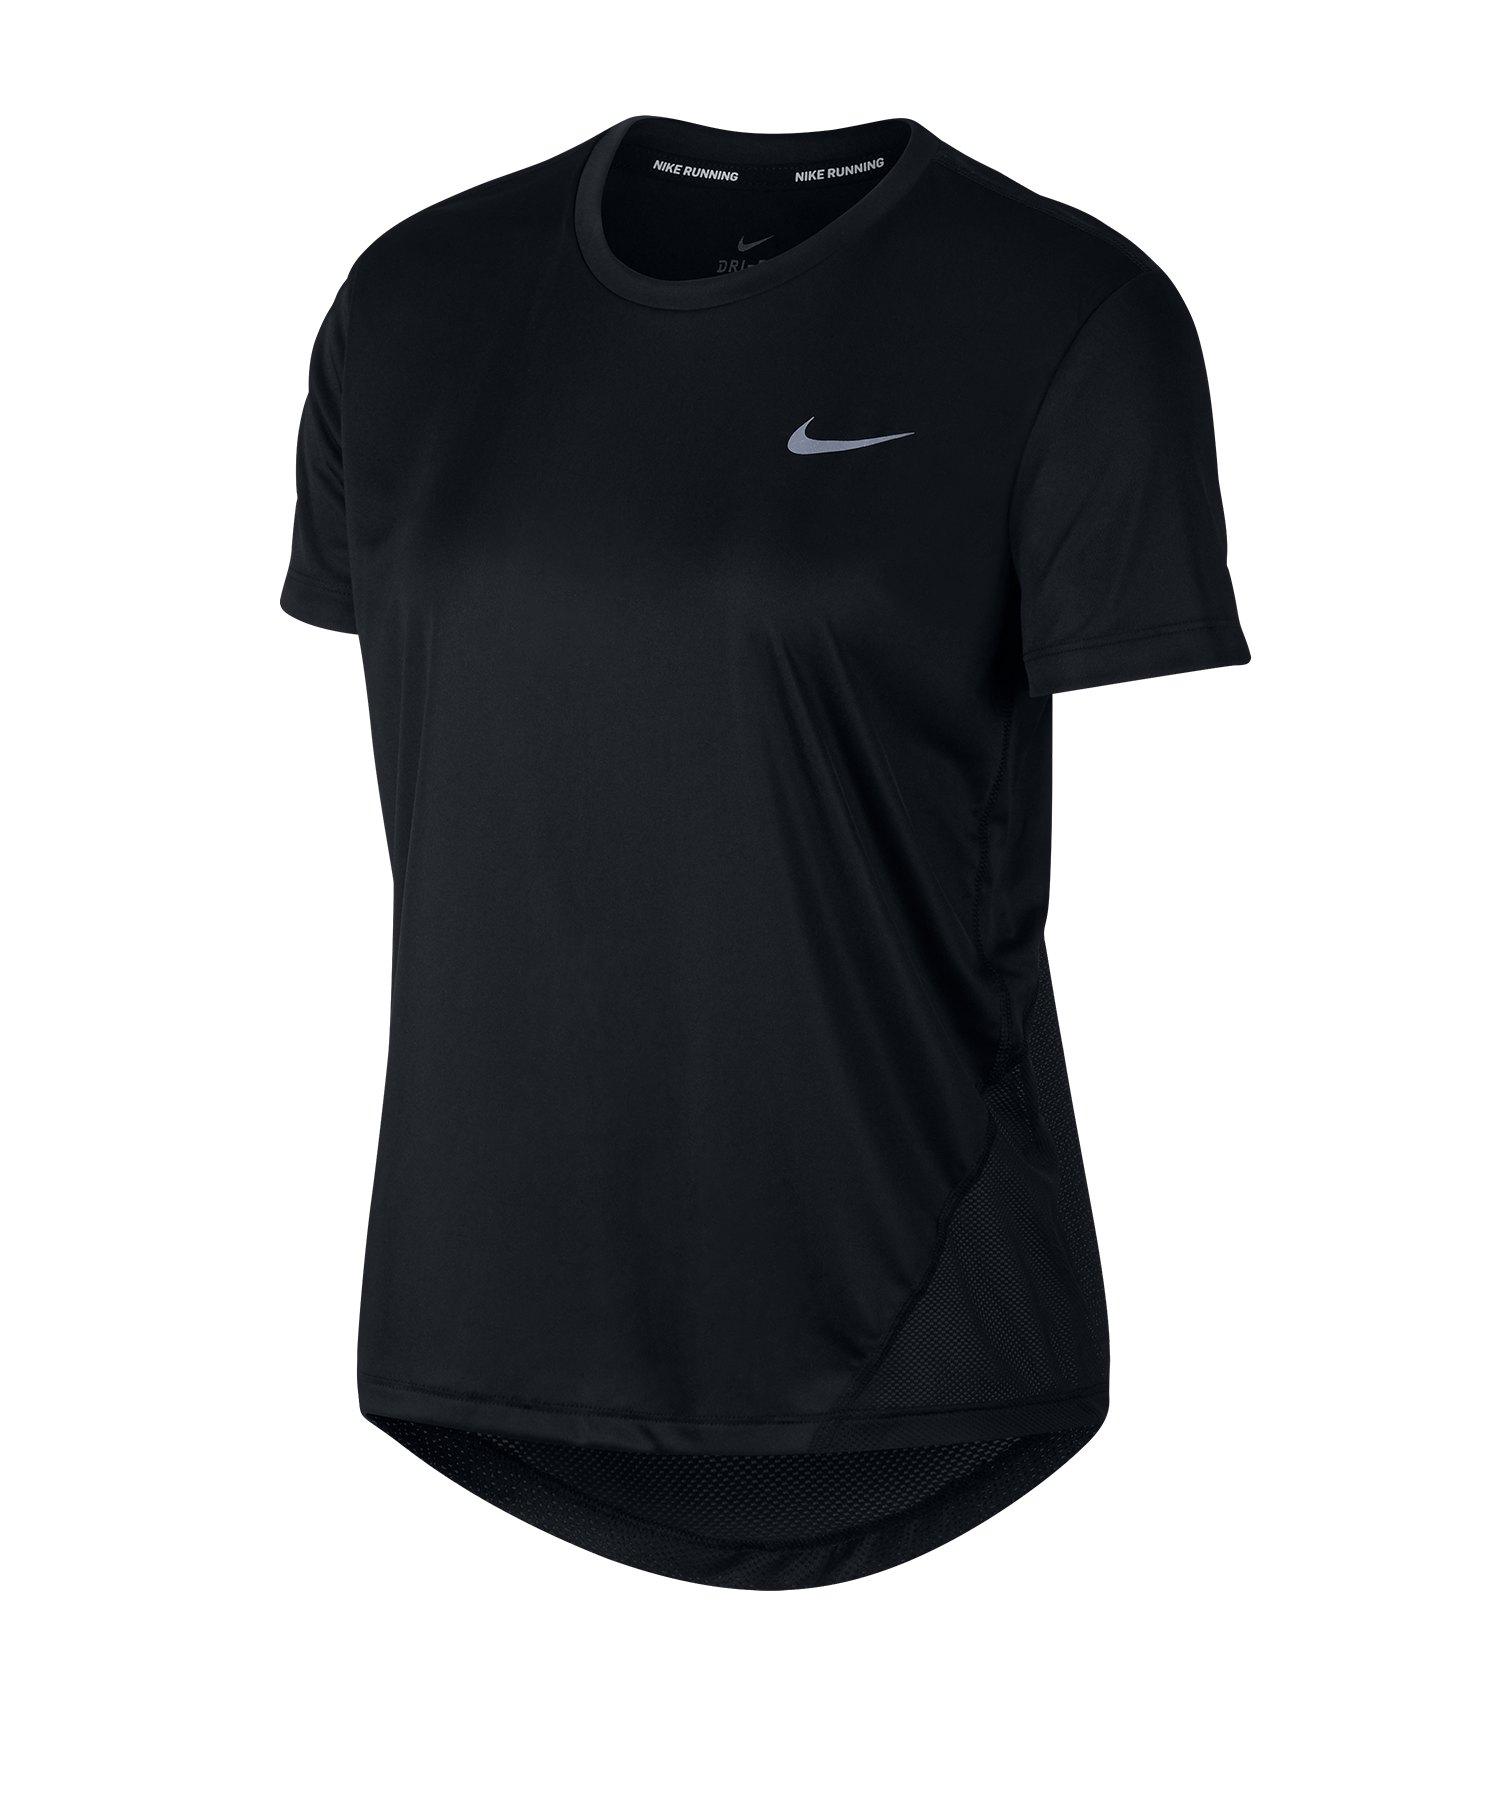 Nike Miller T-Shirt Running Damen Schwarz F010 - schwarz